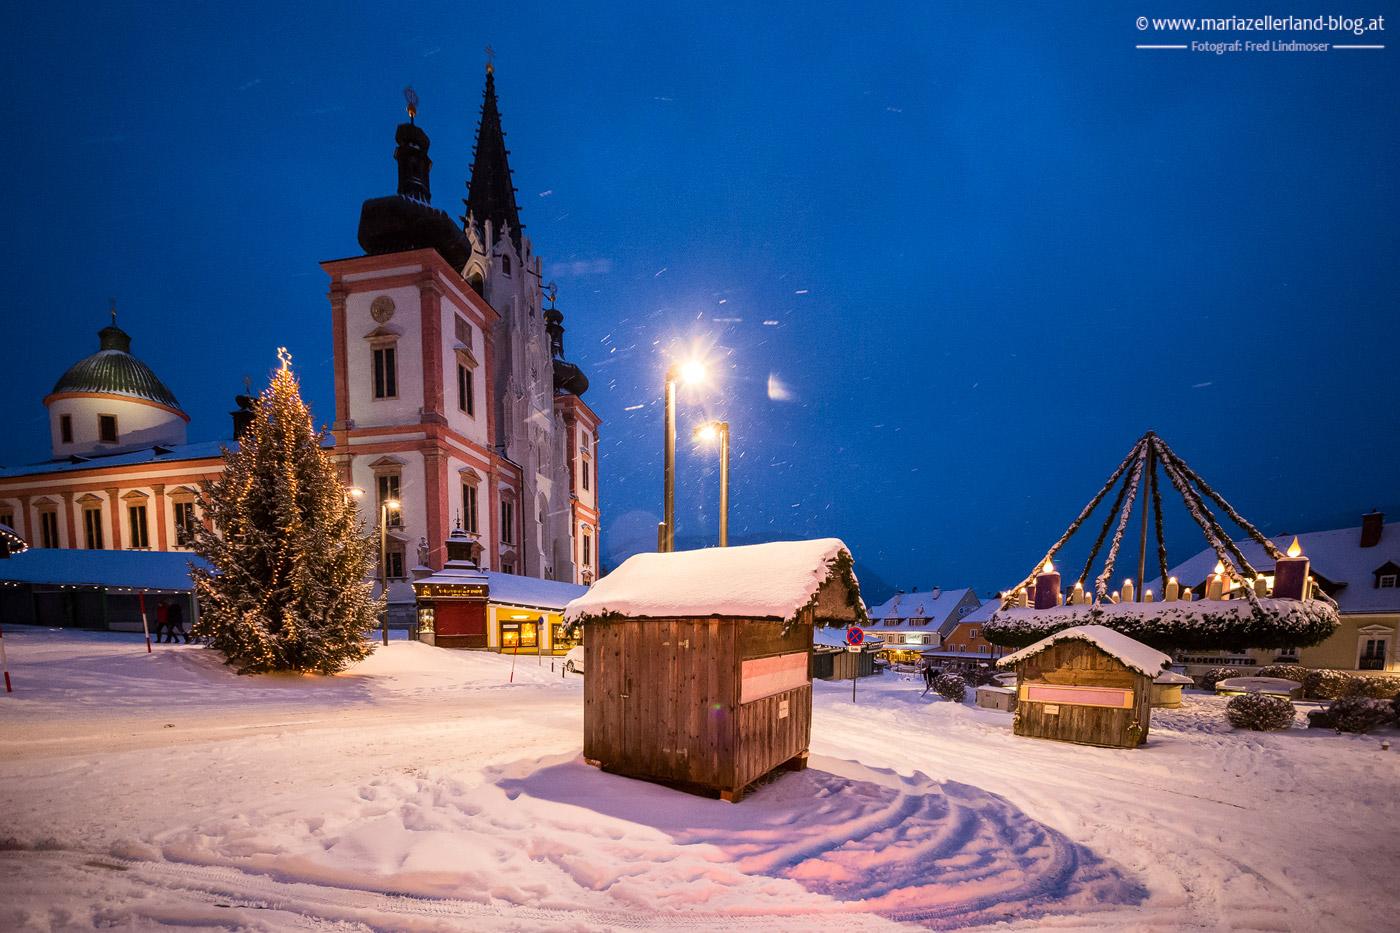 Mariazell-Schnee-Winter-Basilika-IMG_0709